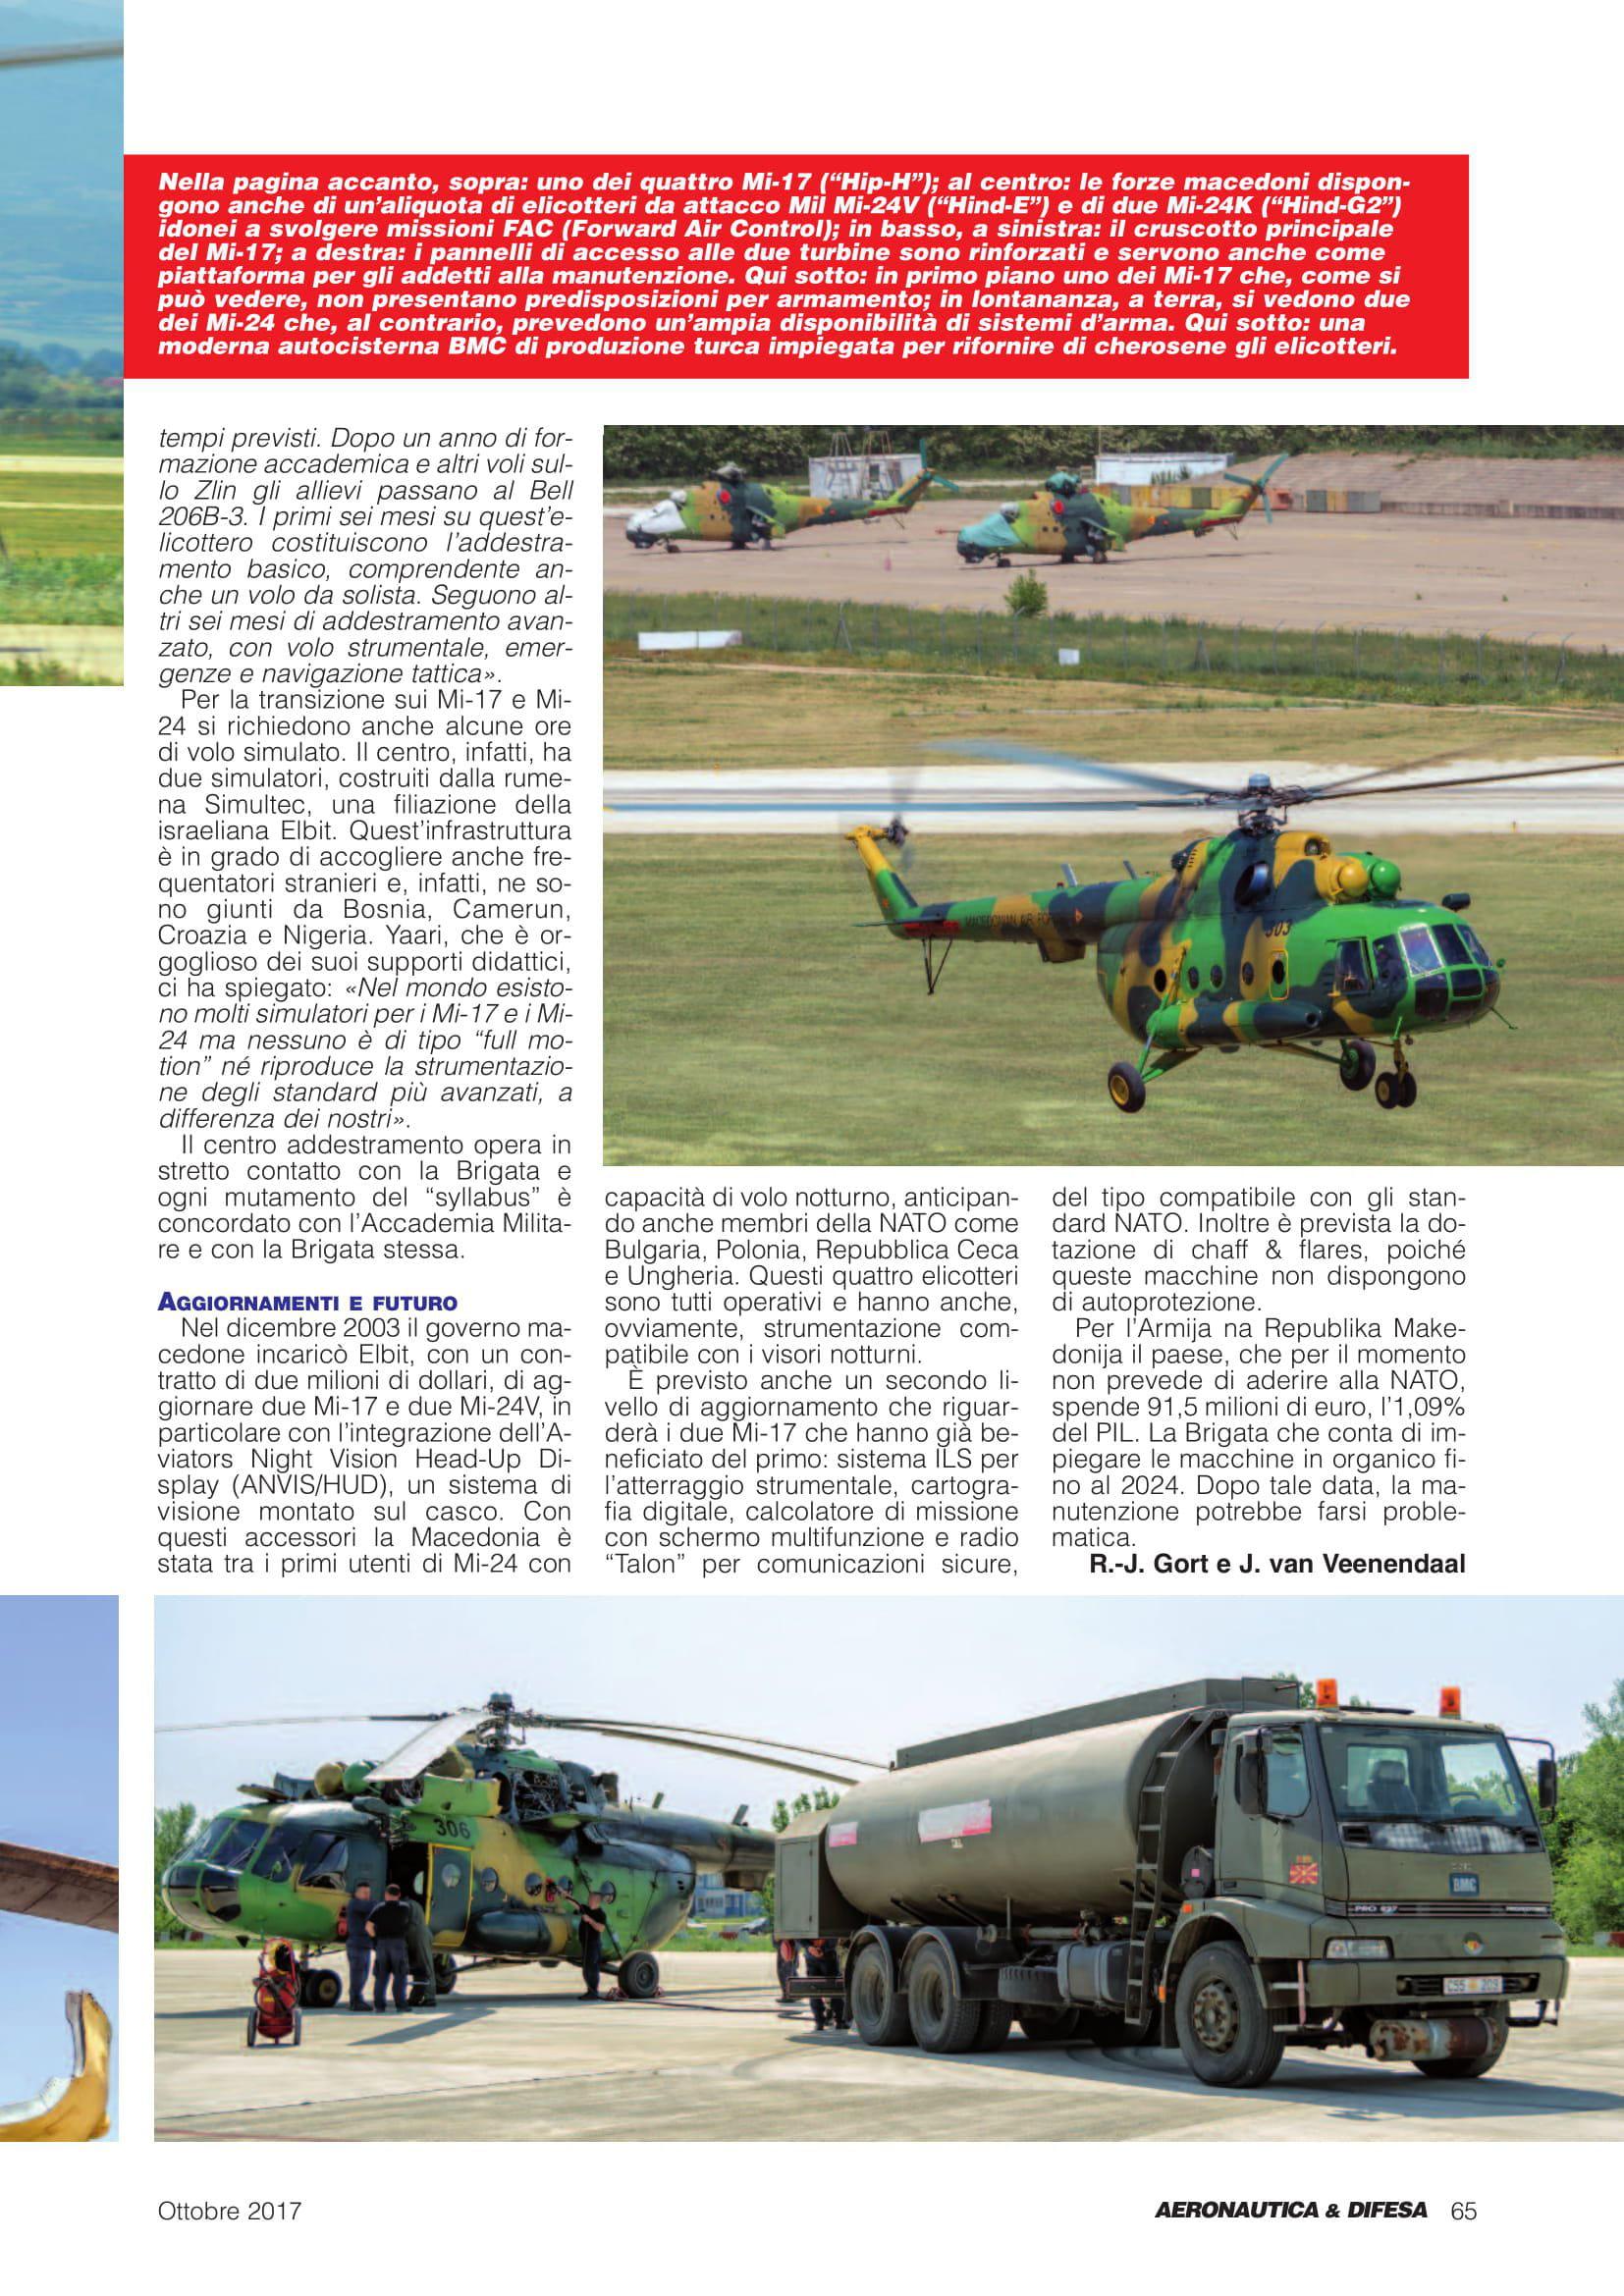 Aeronautica & Difesa (Italy)_Macedonian Air Force-5